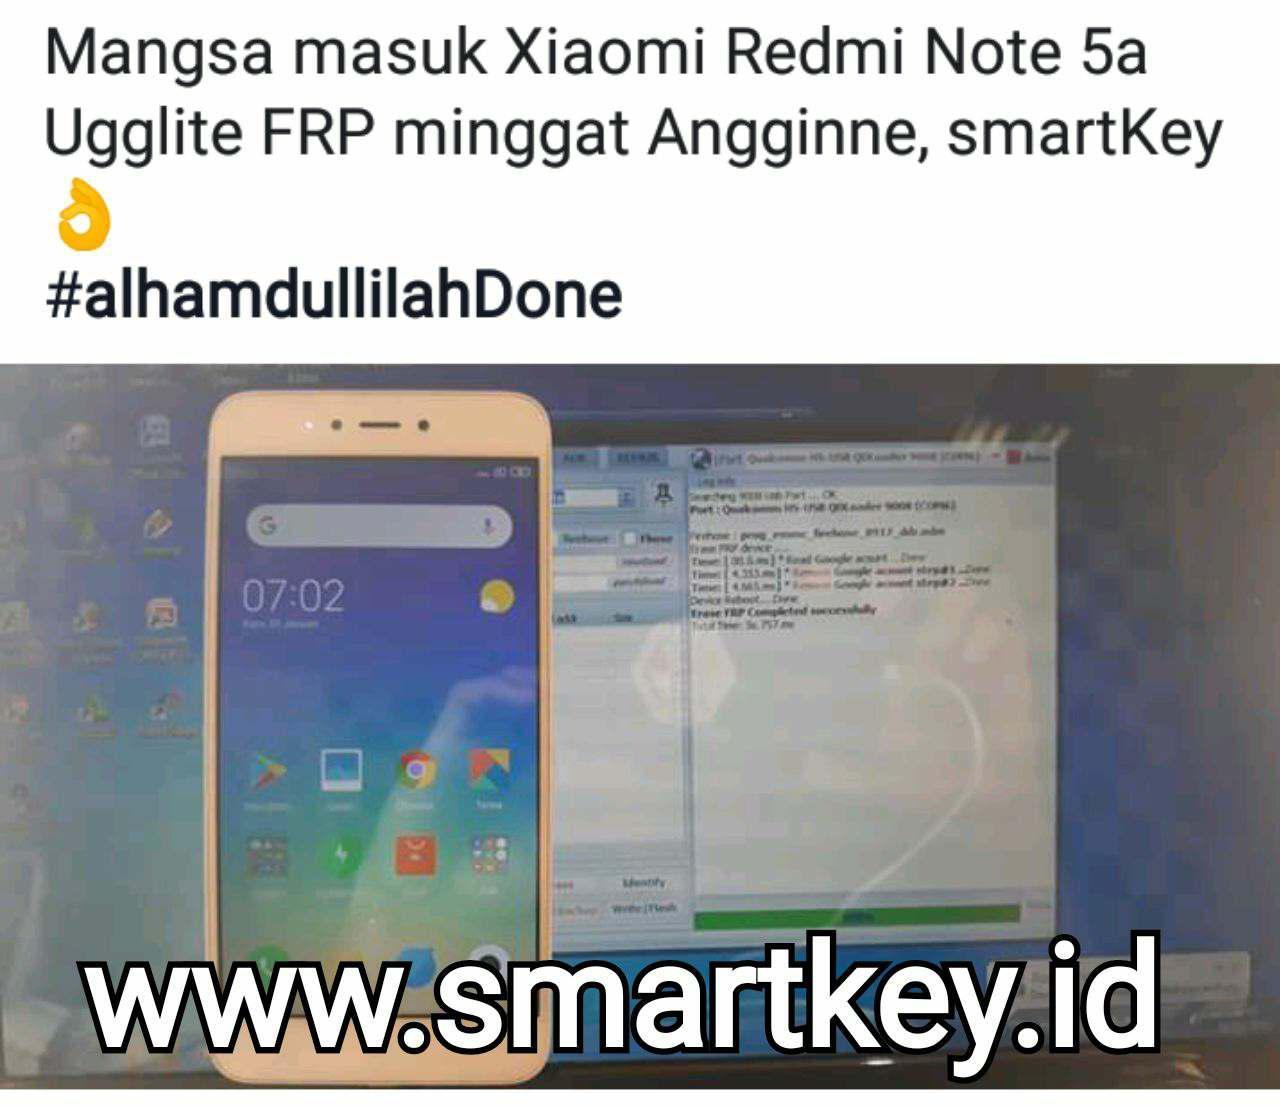 smartkey-019.jpg (1280×1107)